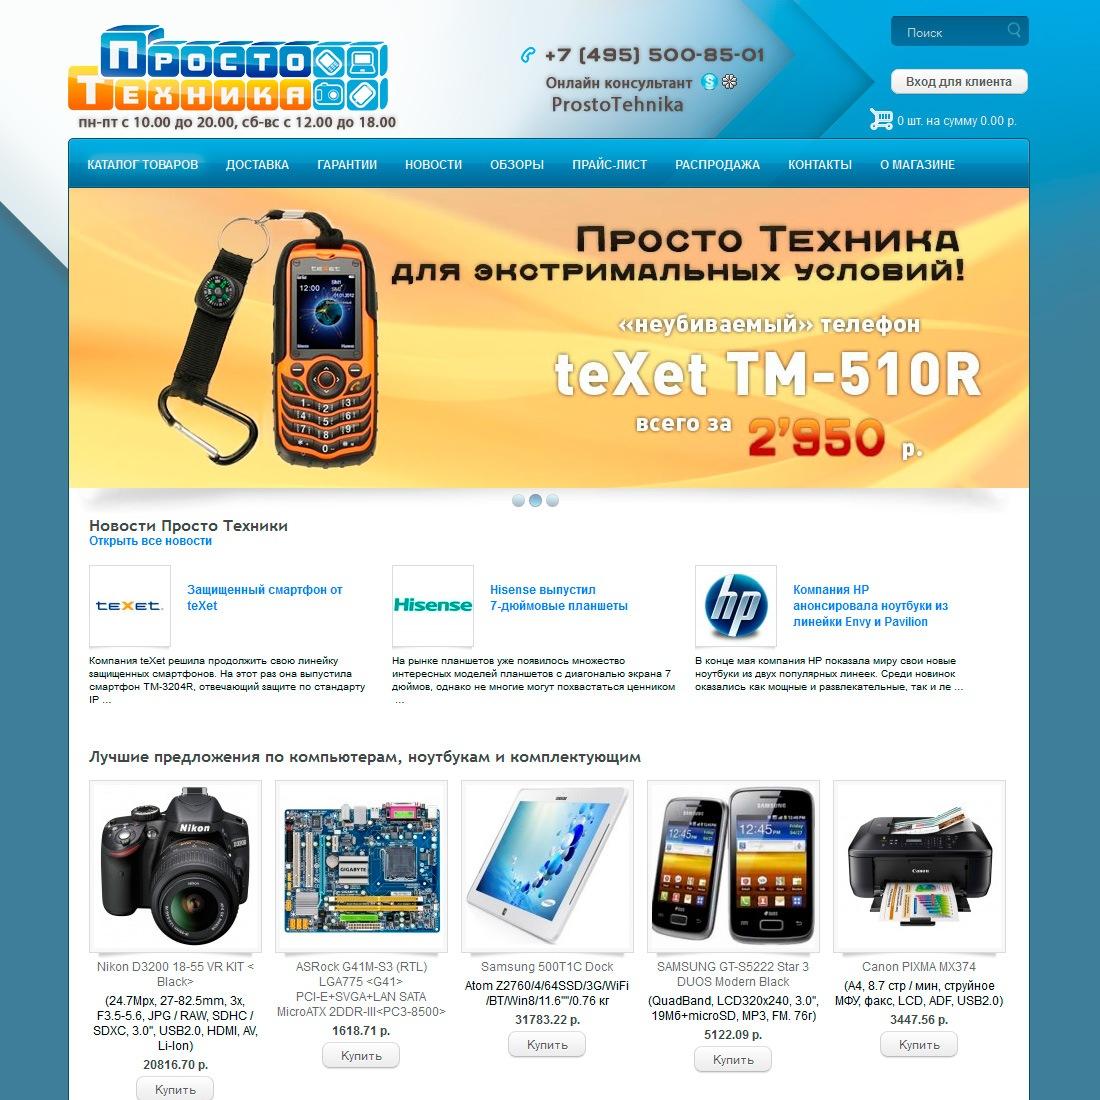 Prostotehnika.ru - Магазин компьютерной техники